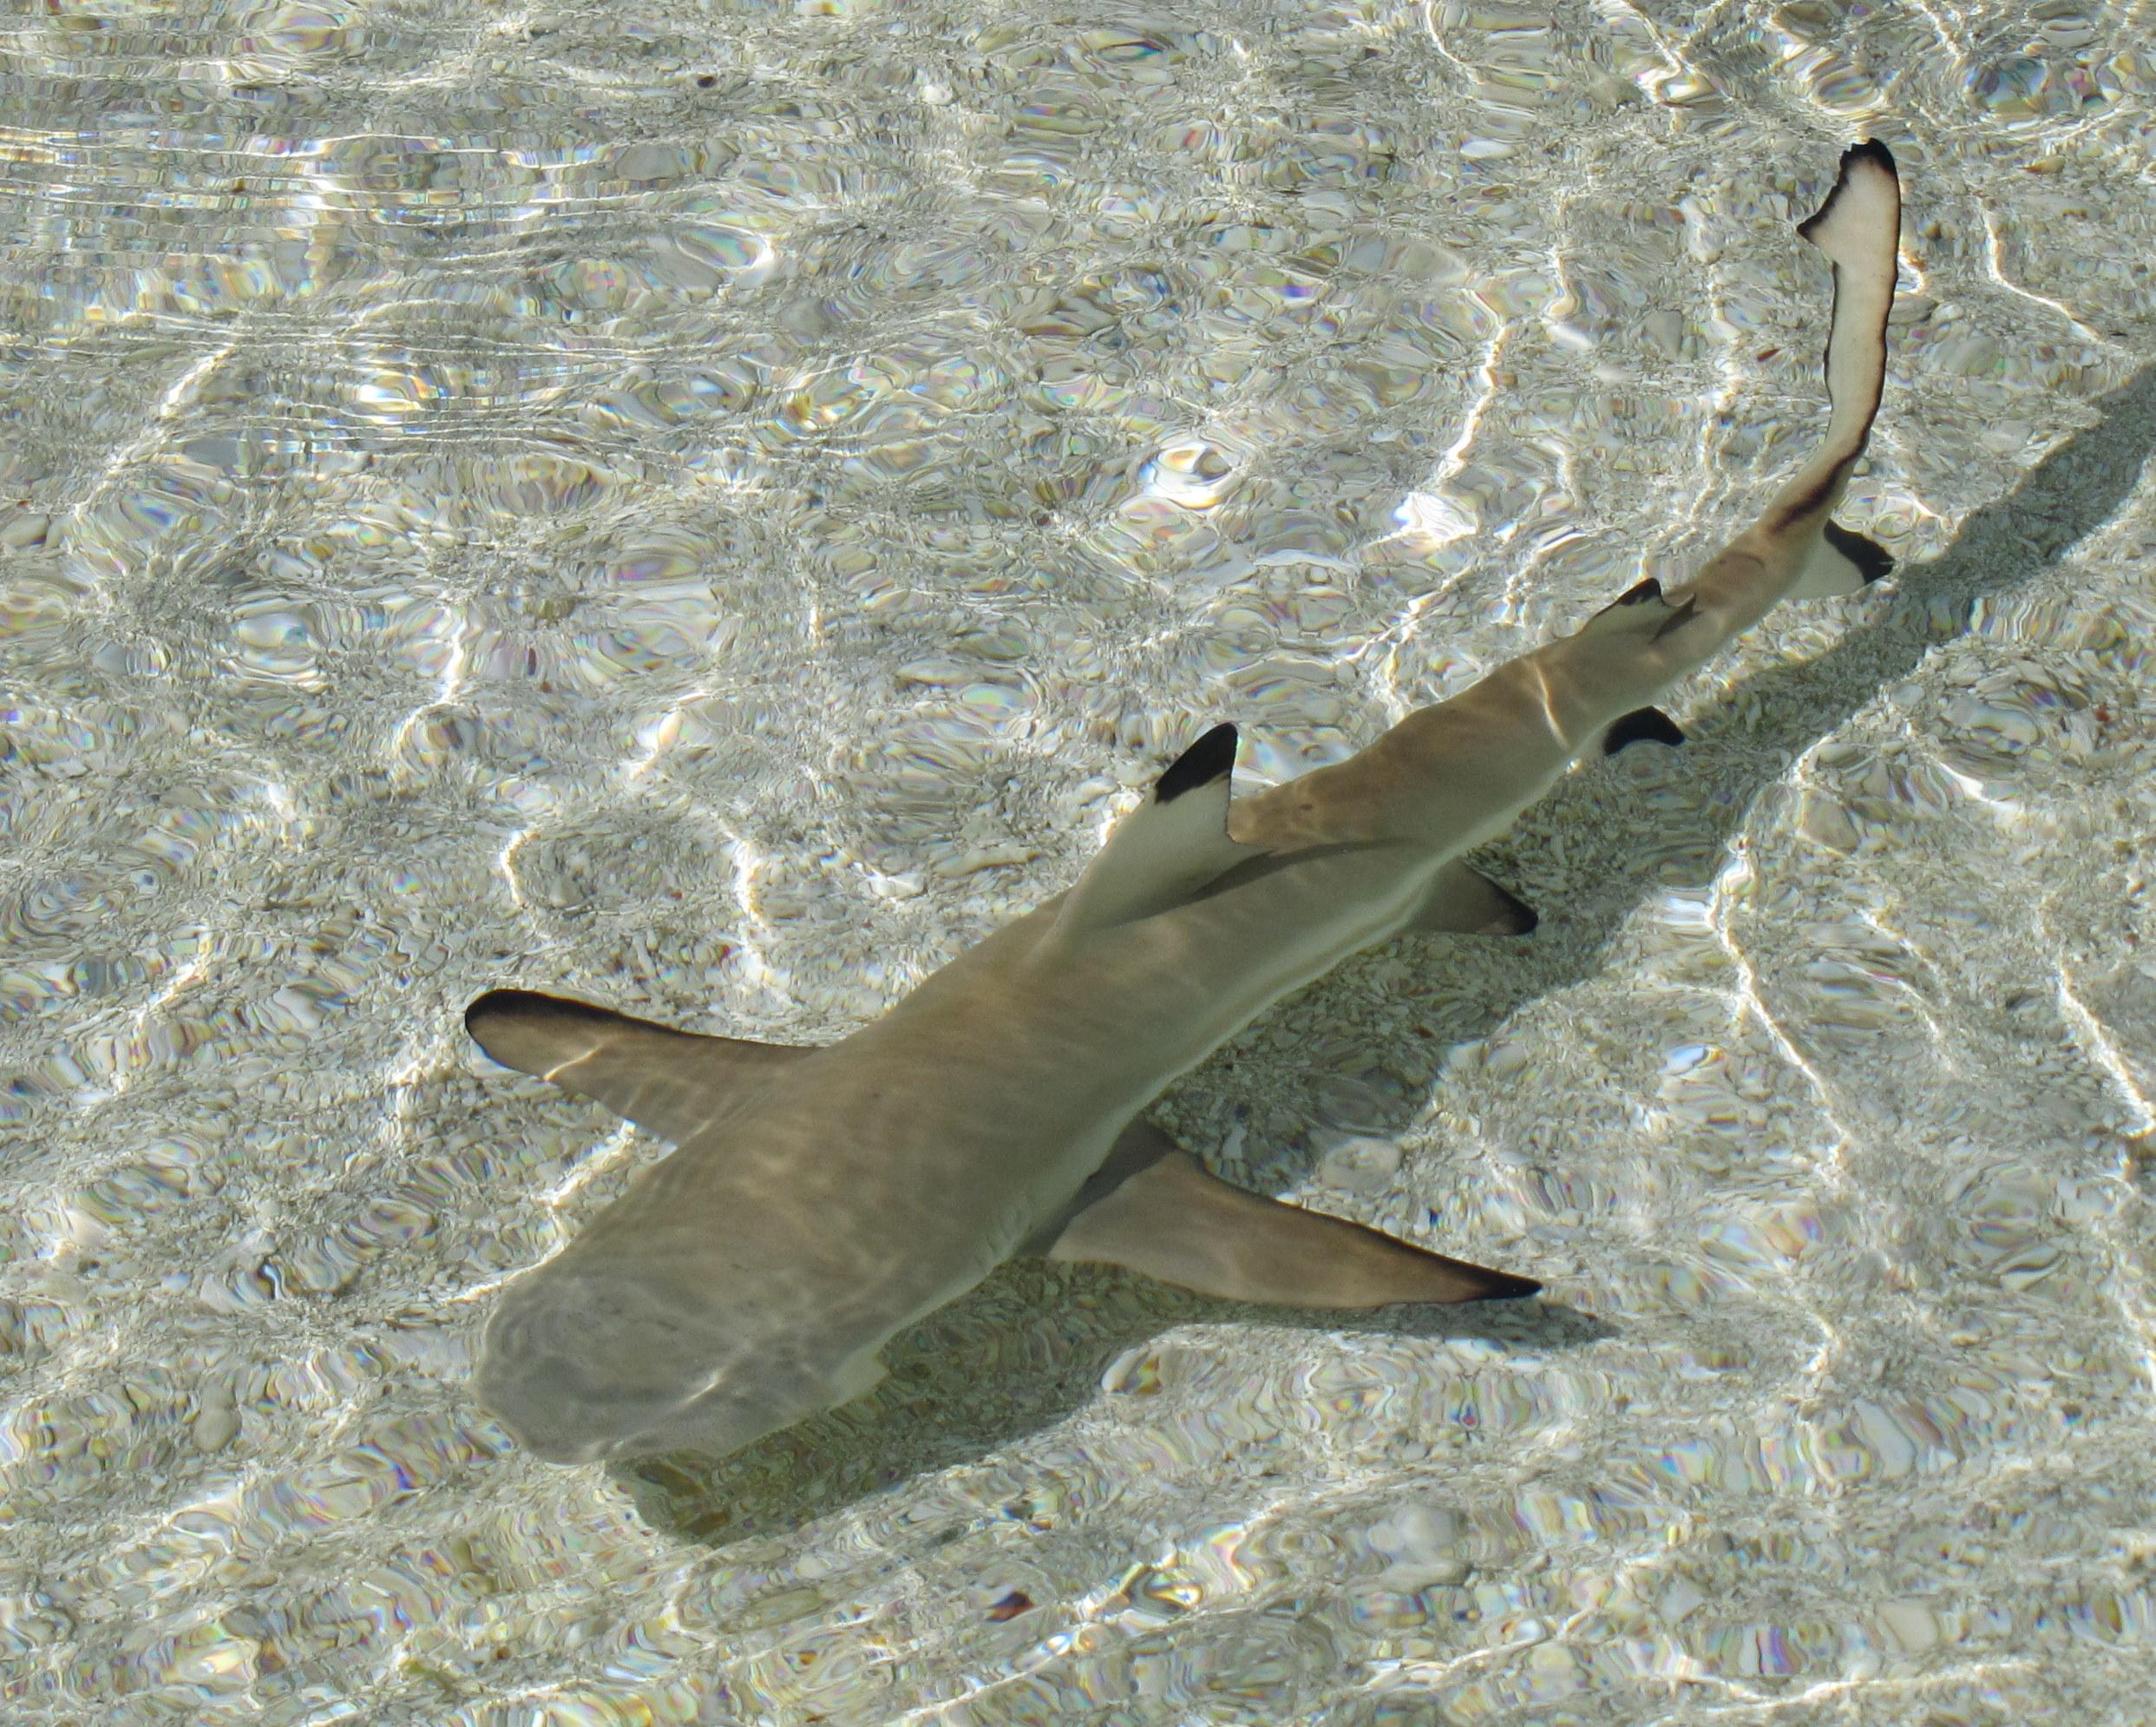 Black-tipped shark